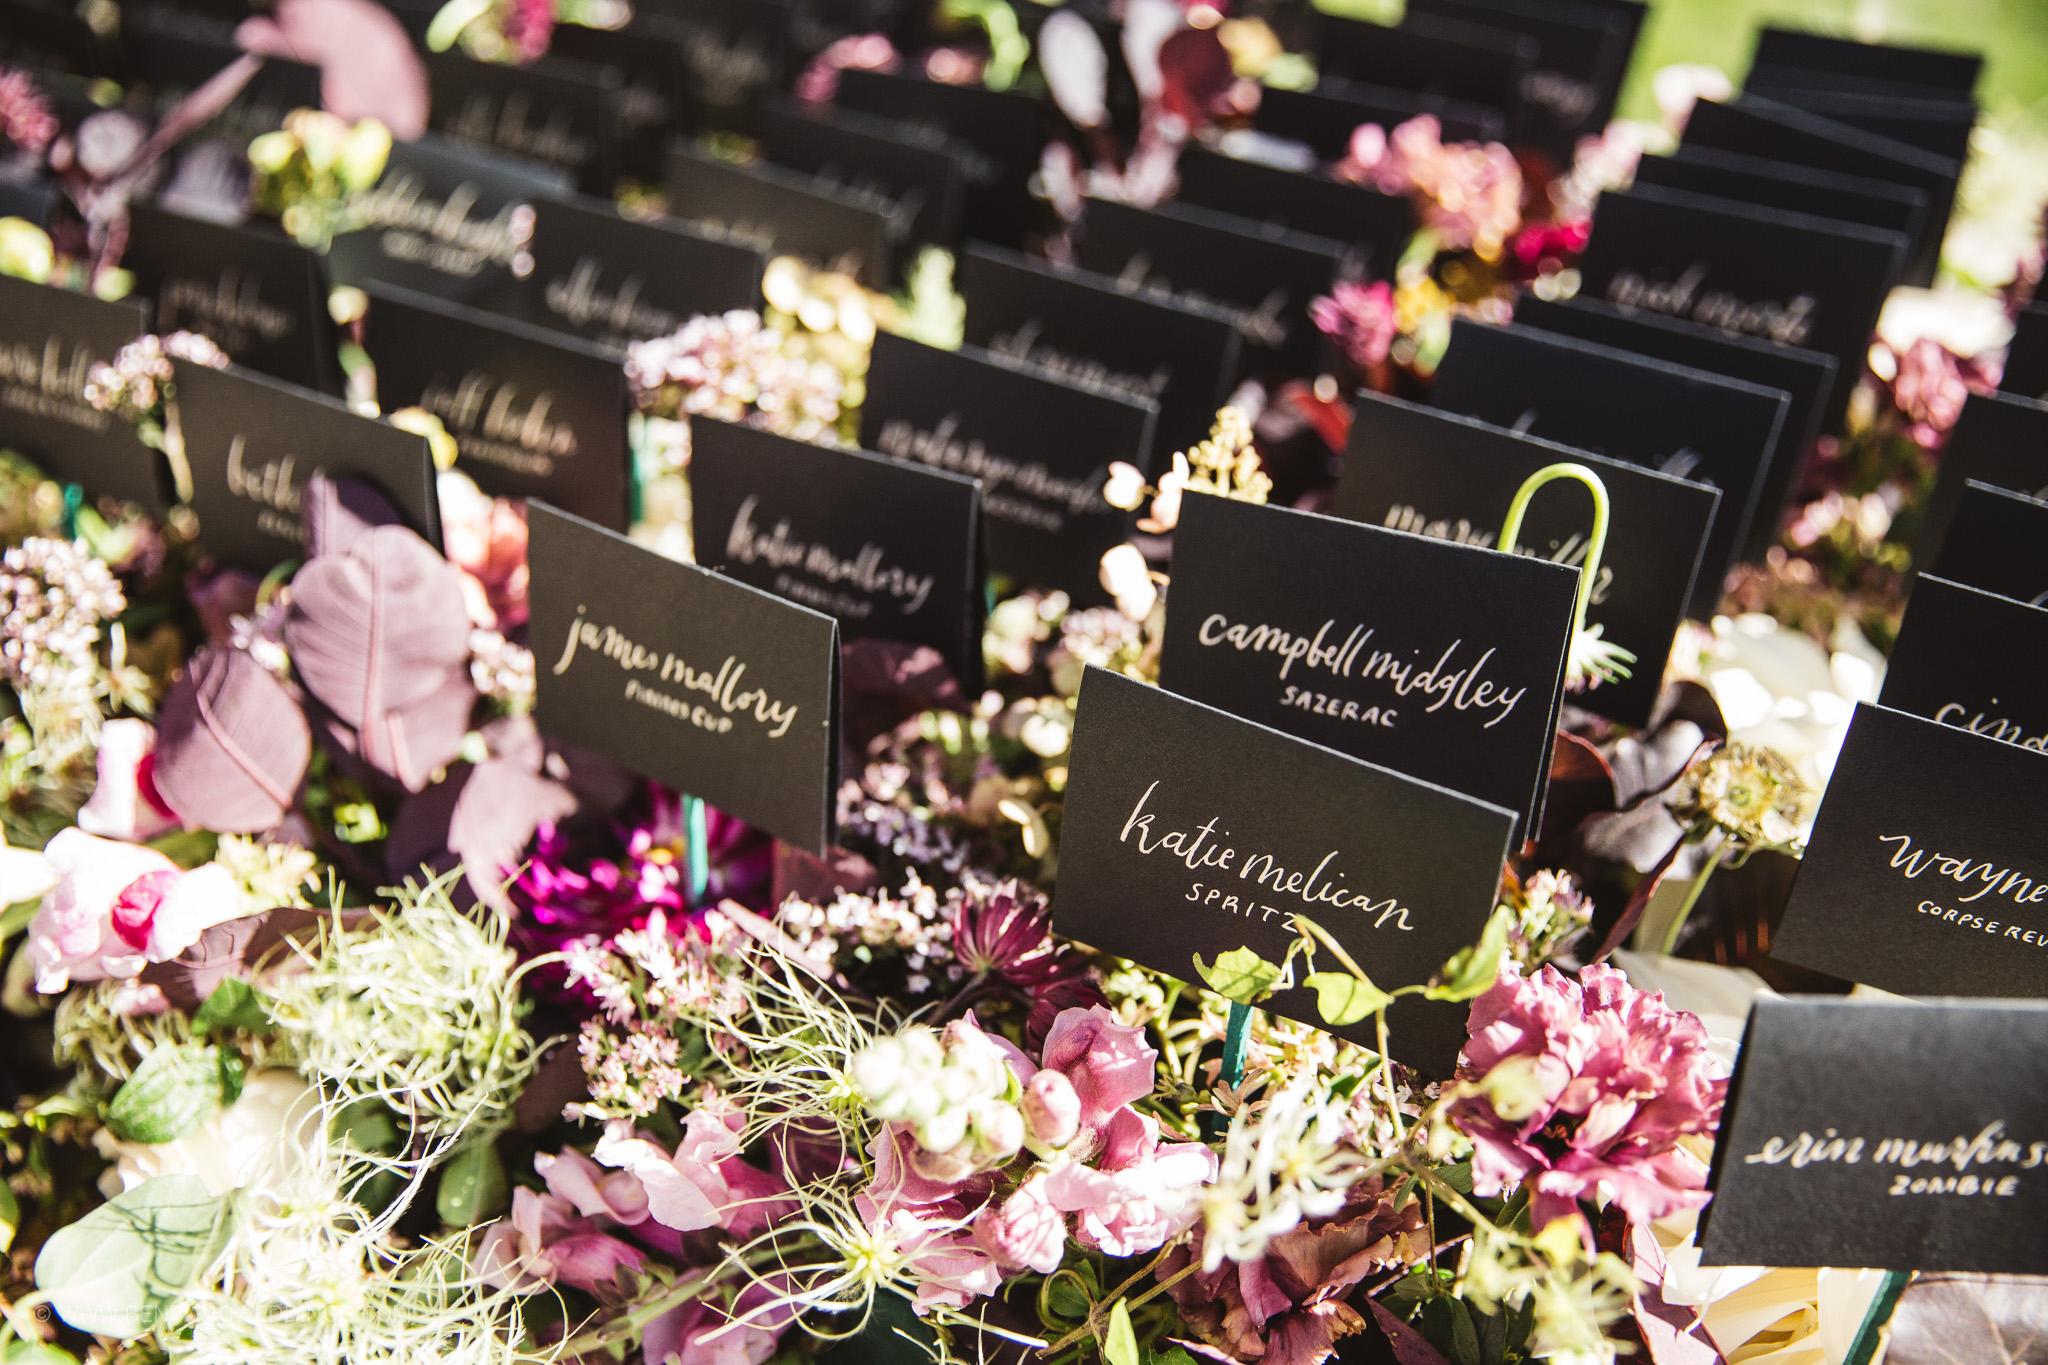 Bridalbliss.com | Portland Seattle Bend Wedding Planner | Oregon Washington Event Design | Ben Pigao Photography